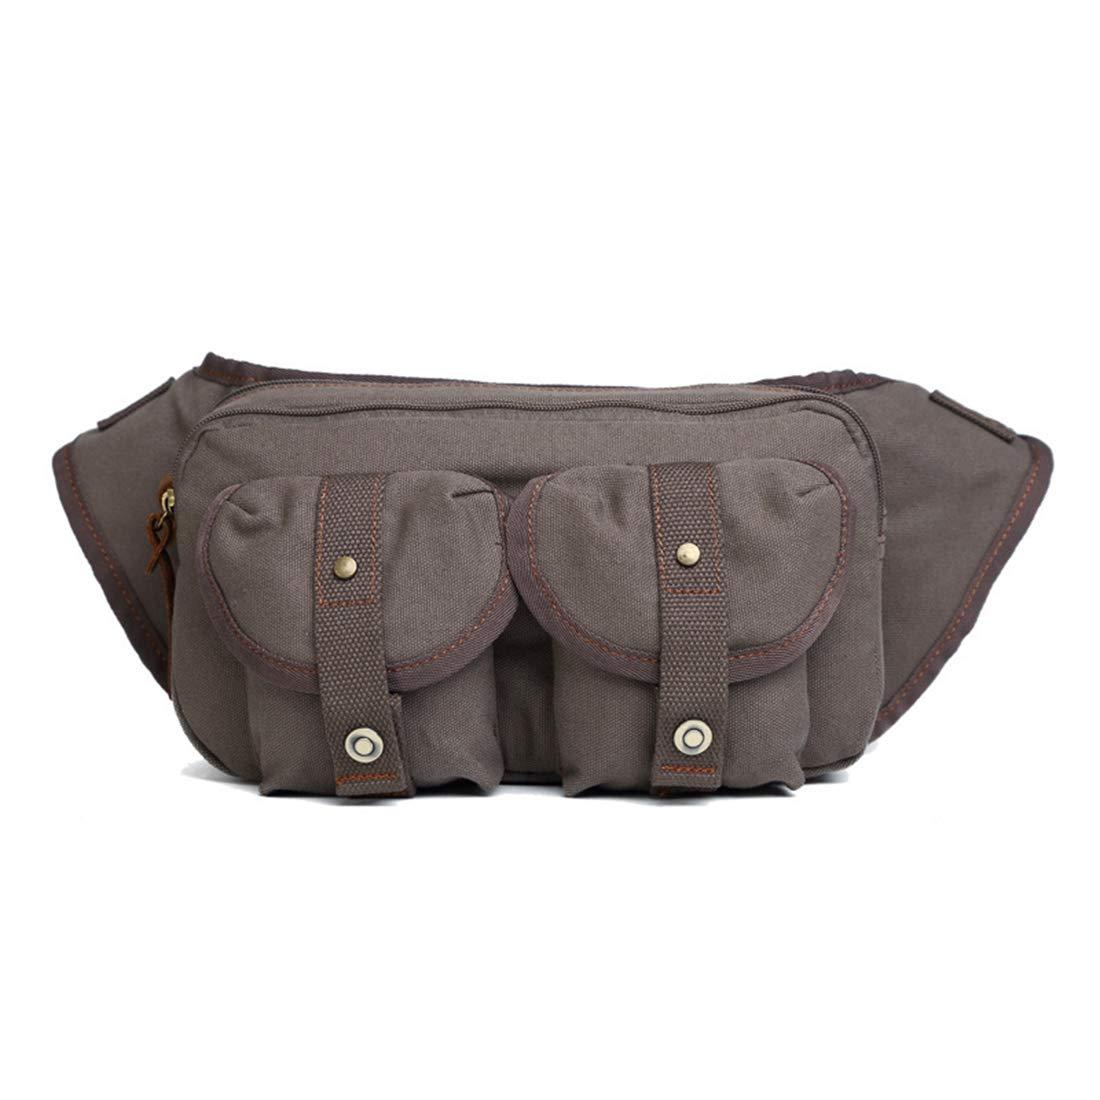 RABILTY Bulk Capacity Brown Canvas 26177 Waist Bag Crossbody Fanny Pack Organizer,Travel Neck Pouch Color : Gray